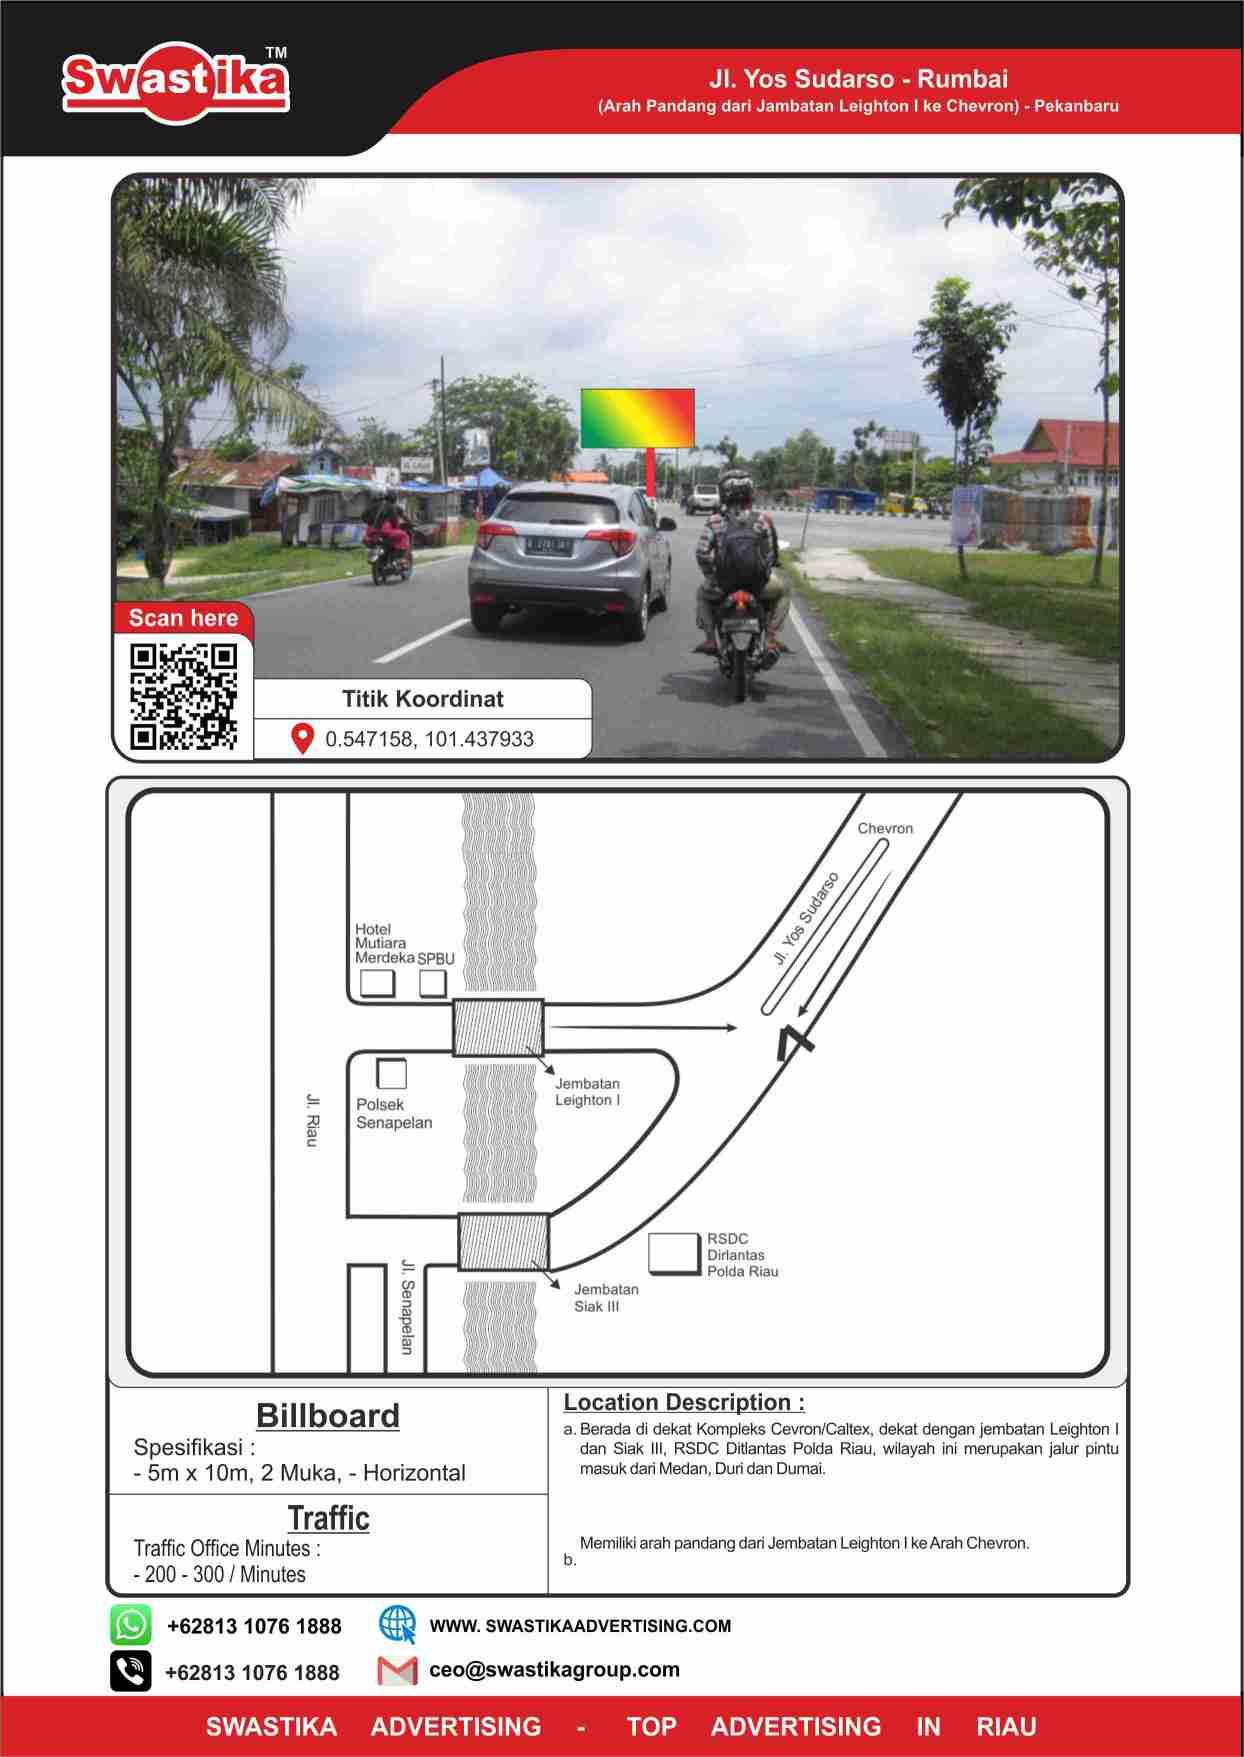 Jl Yos Sudarso - Rumbai (Arah dari Leighton 1 ke Chevron)